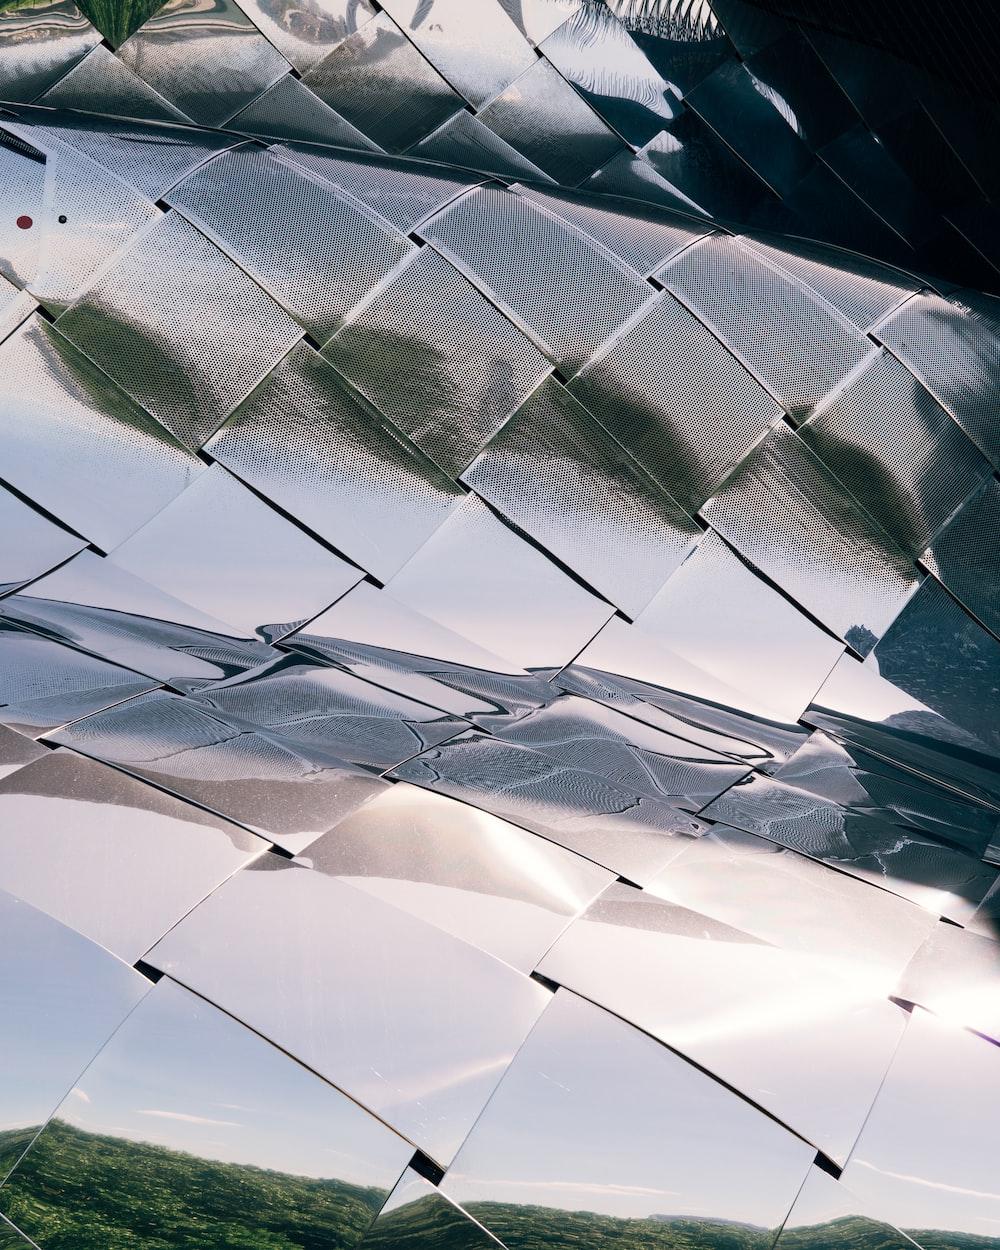 closeup photo of woven silver foil